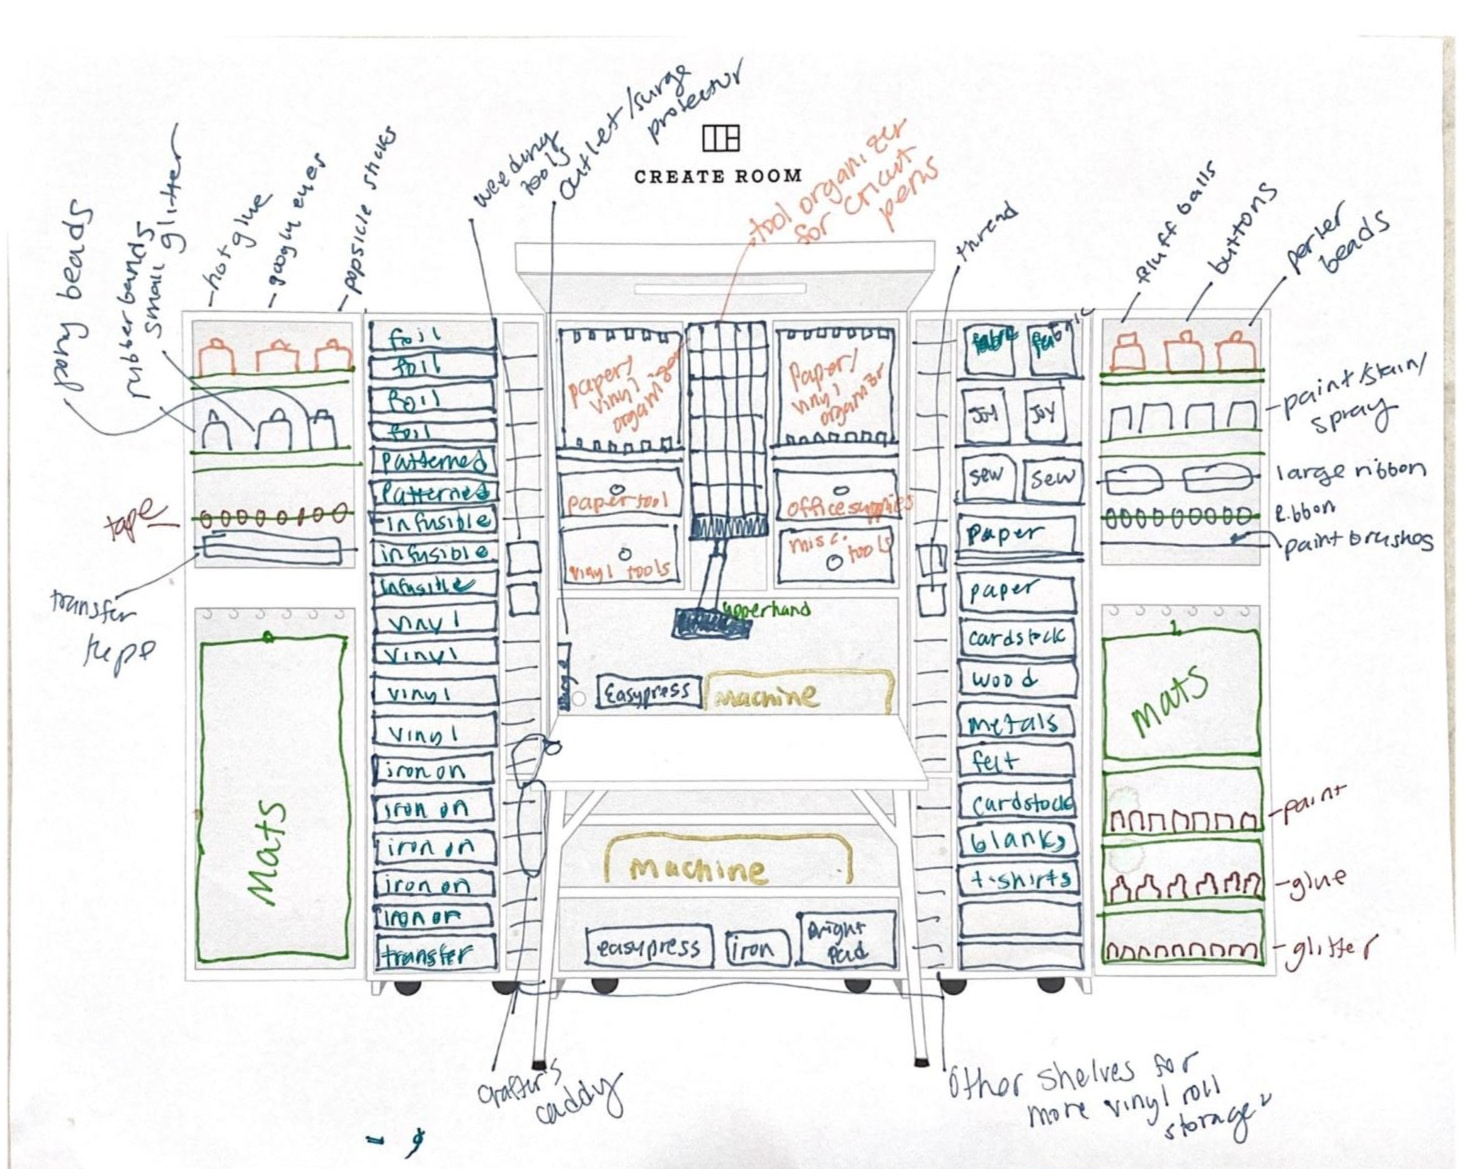 A diagram of a dreambox